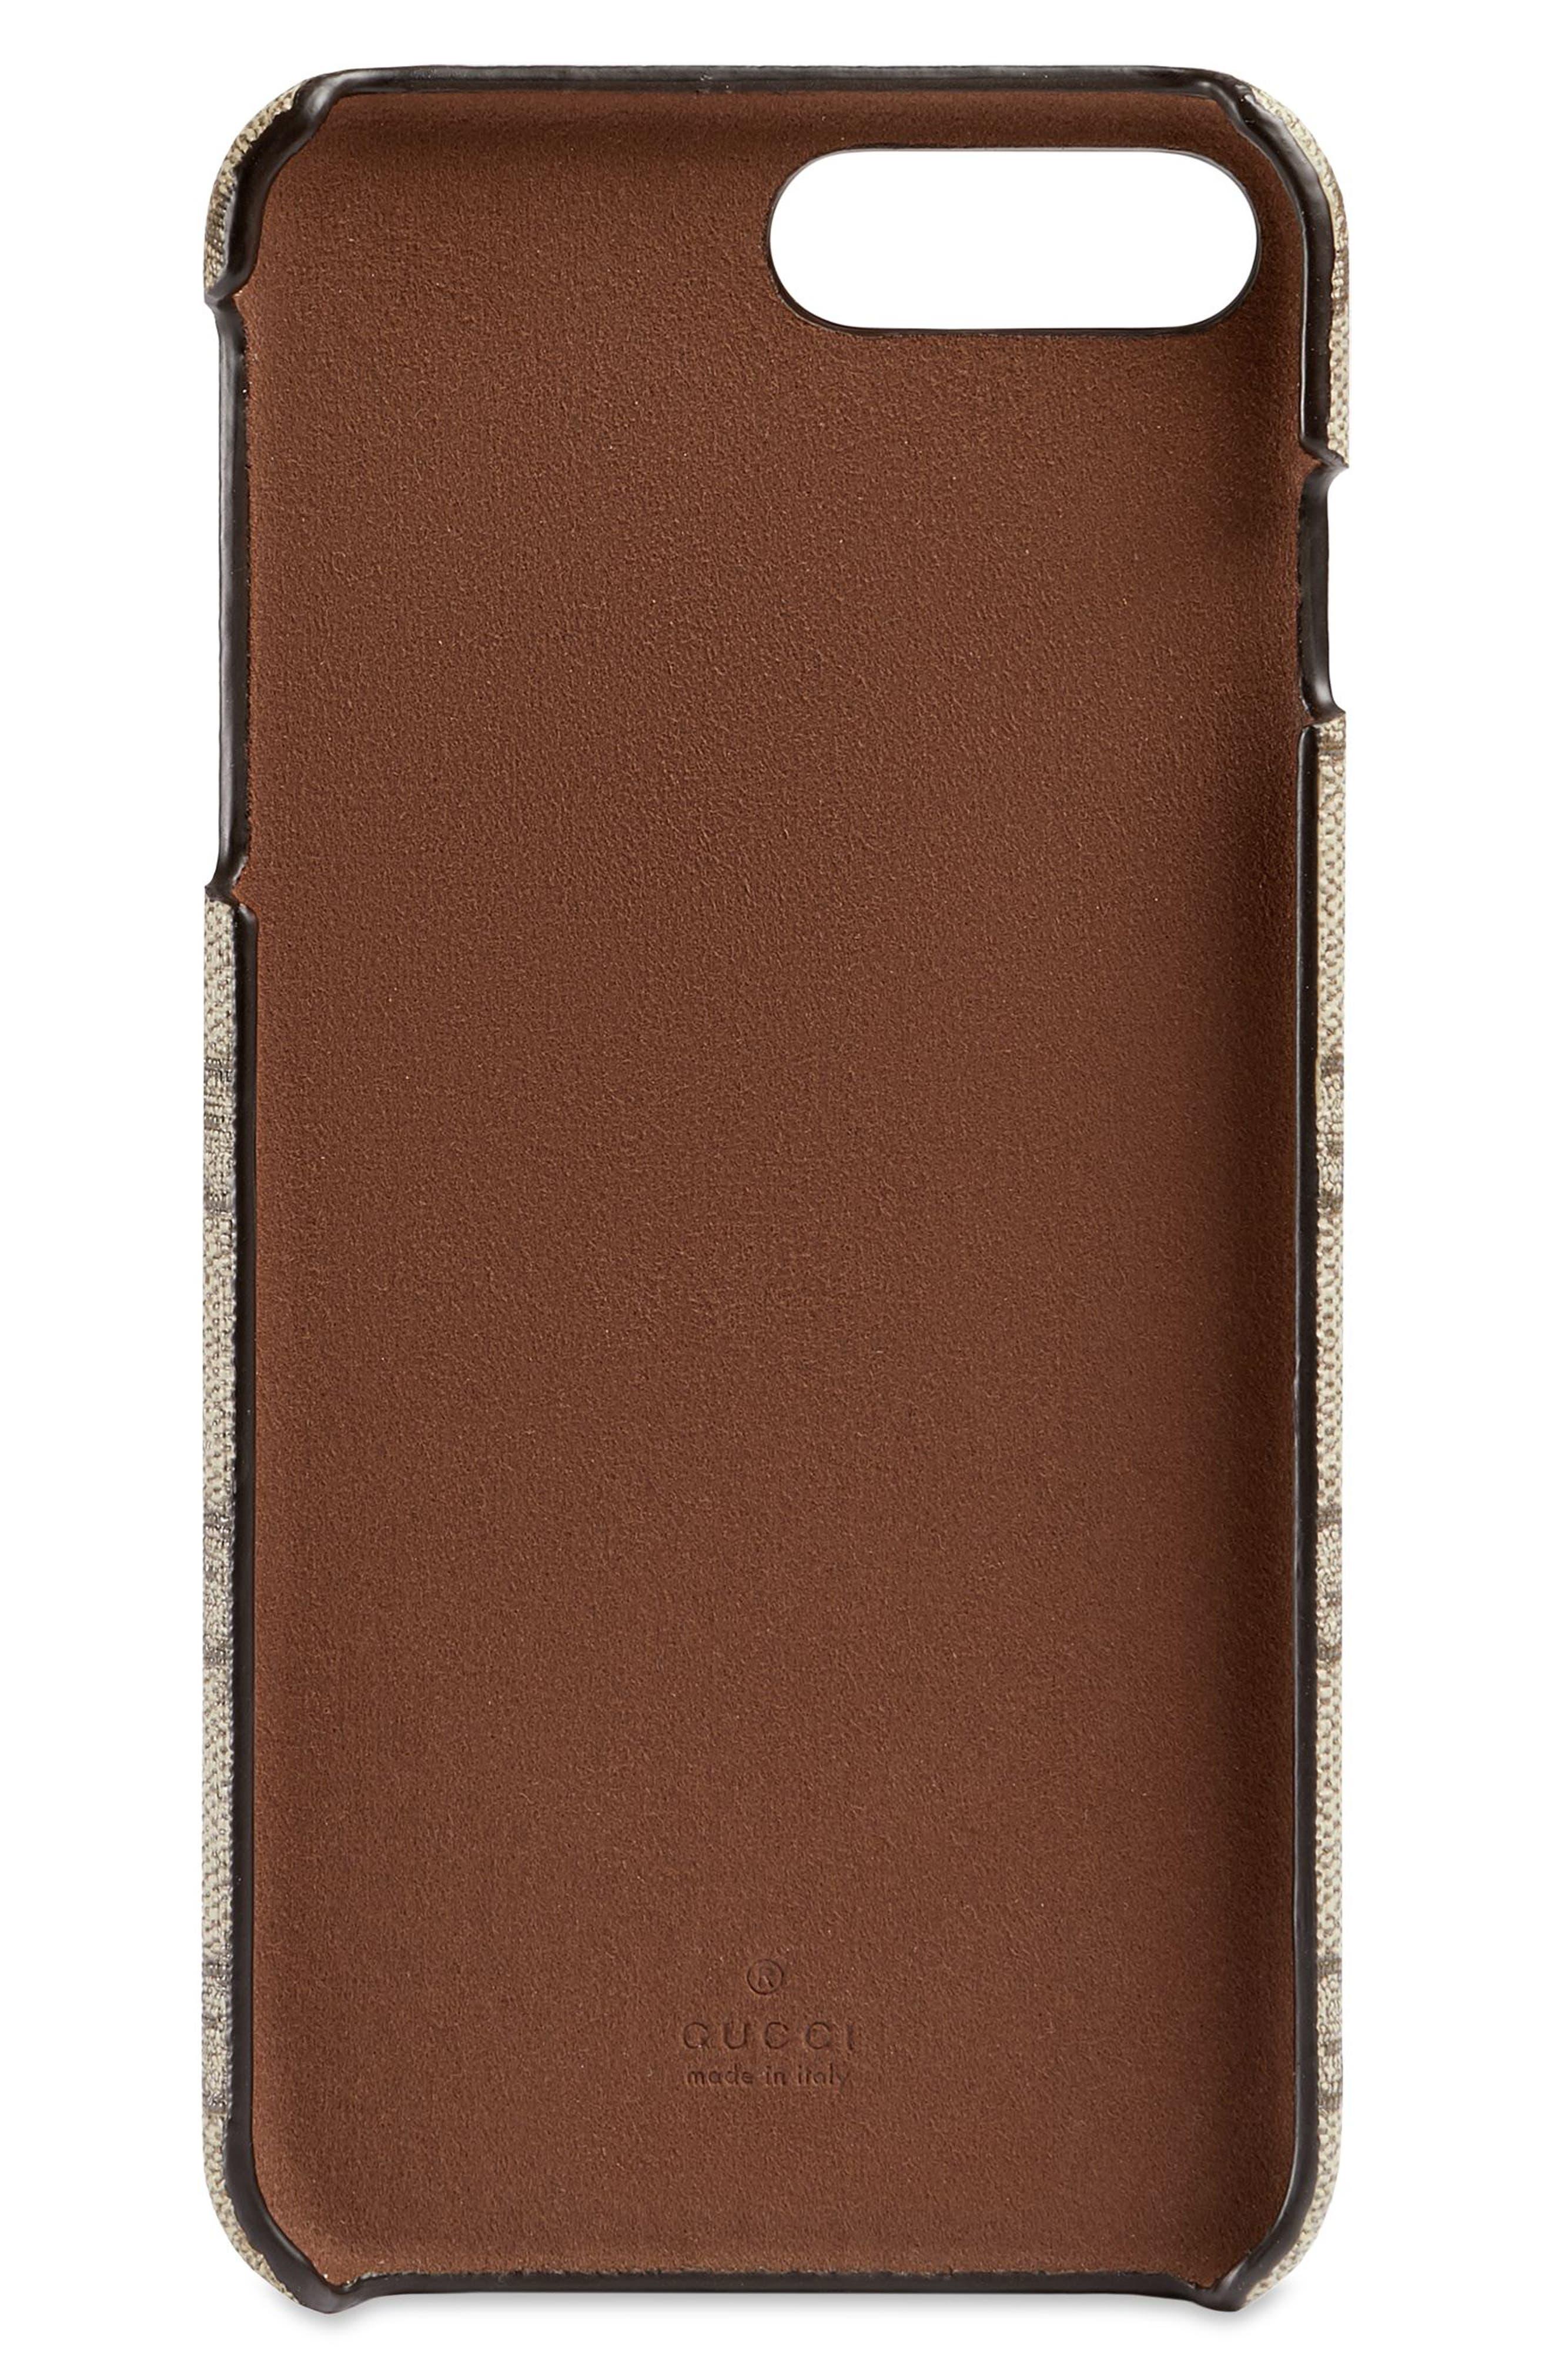 ,                             GG Supreme iPhone 8+ Case,                             Alternate thumbnail 2, color,                             BEIGE EBONY/ LIGHT BROWN